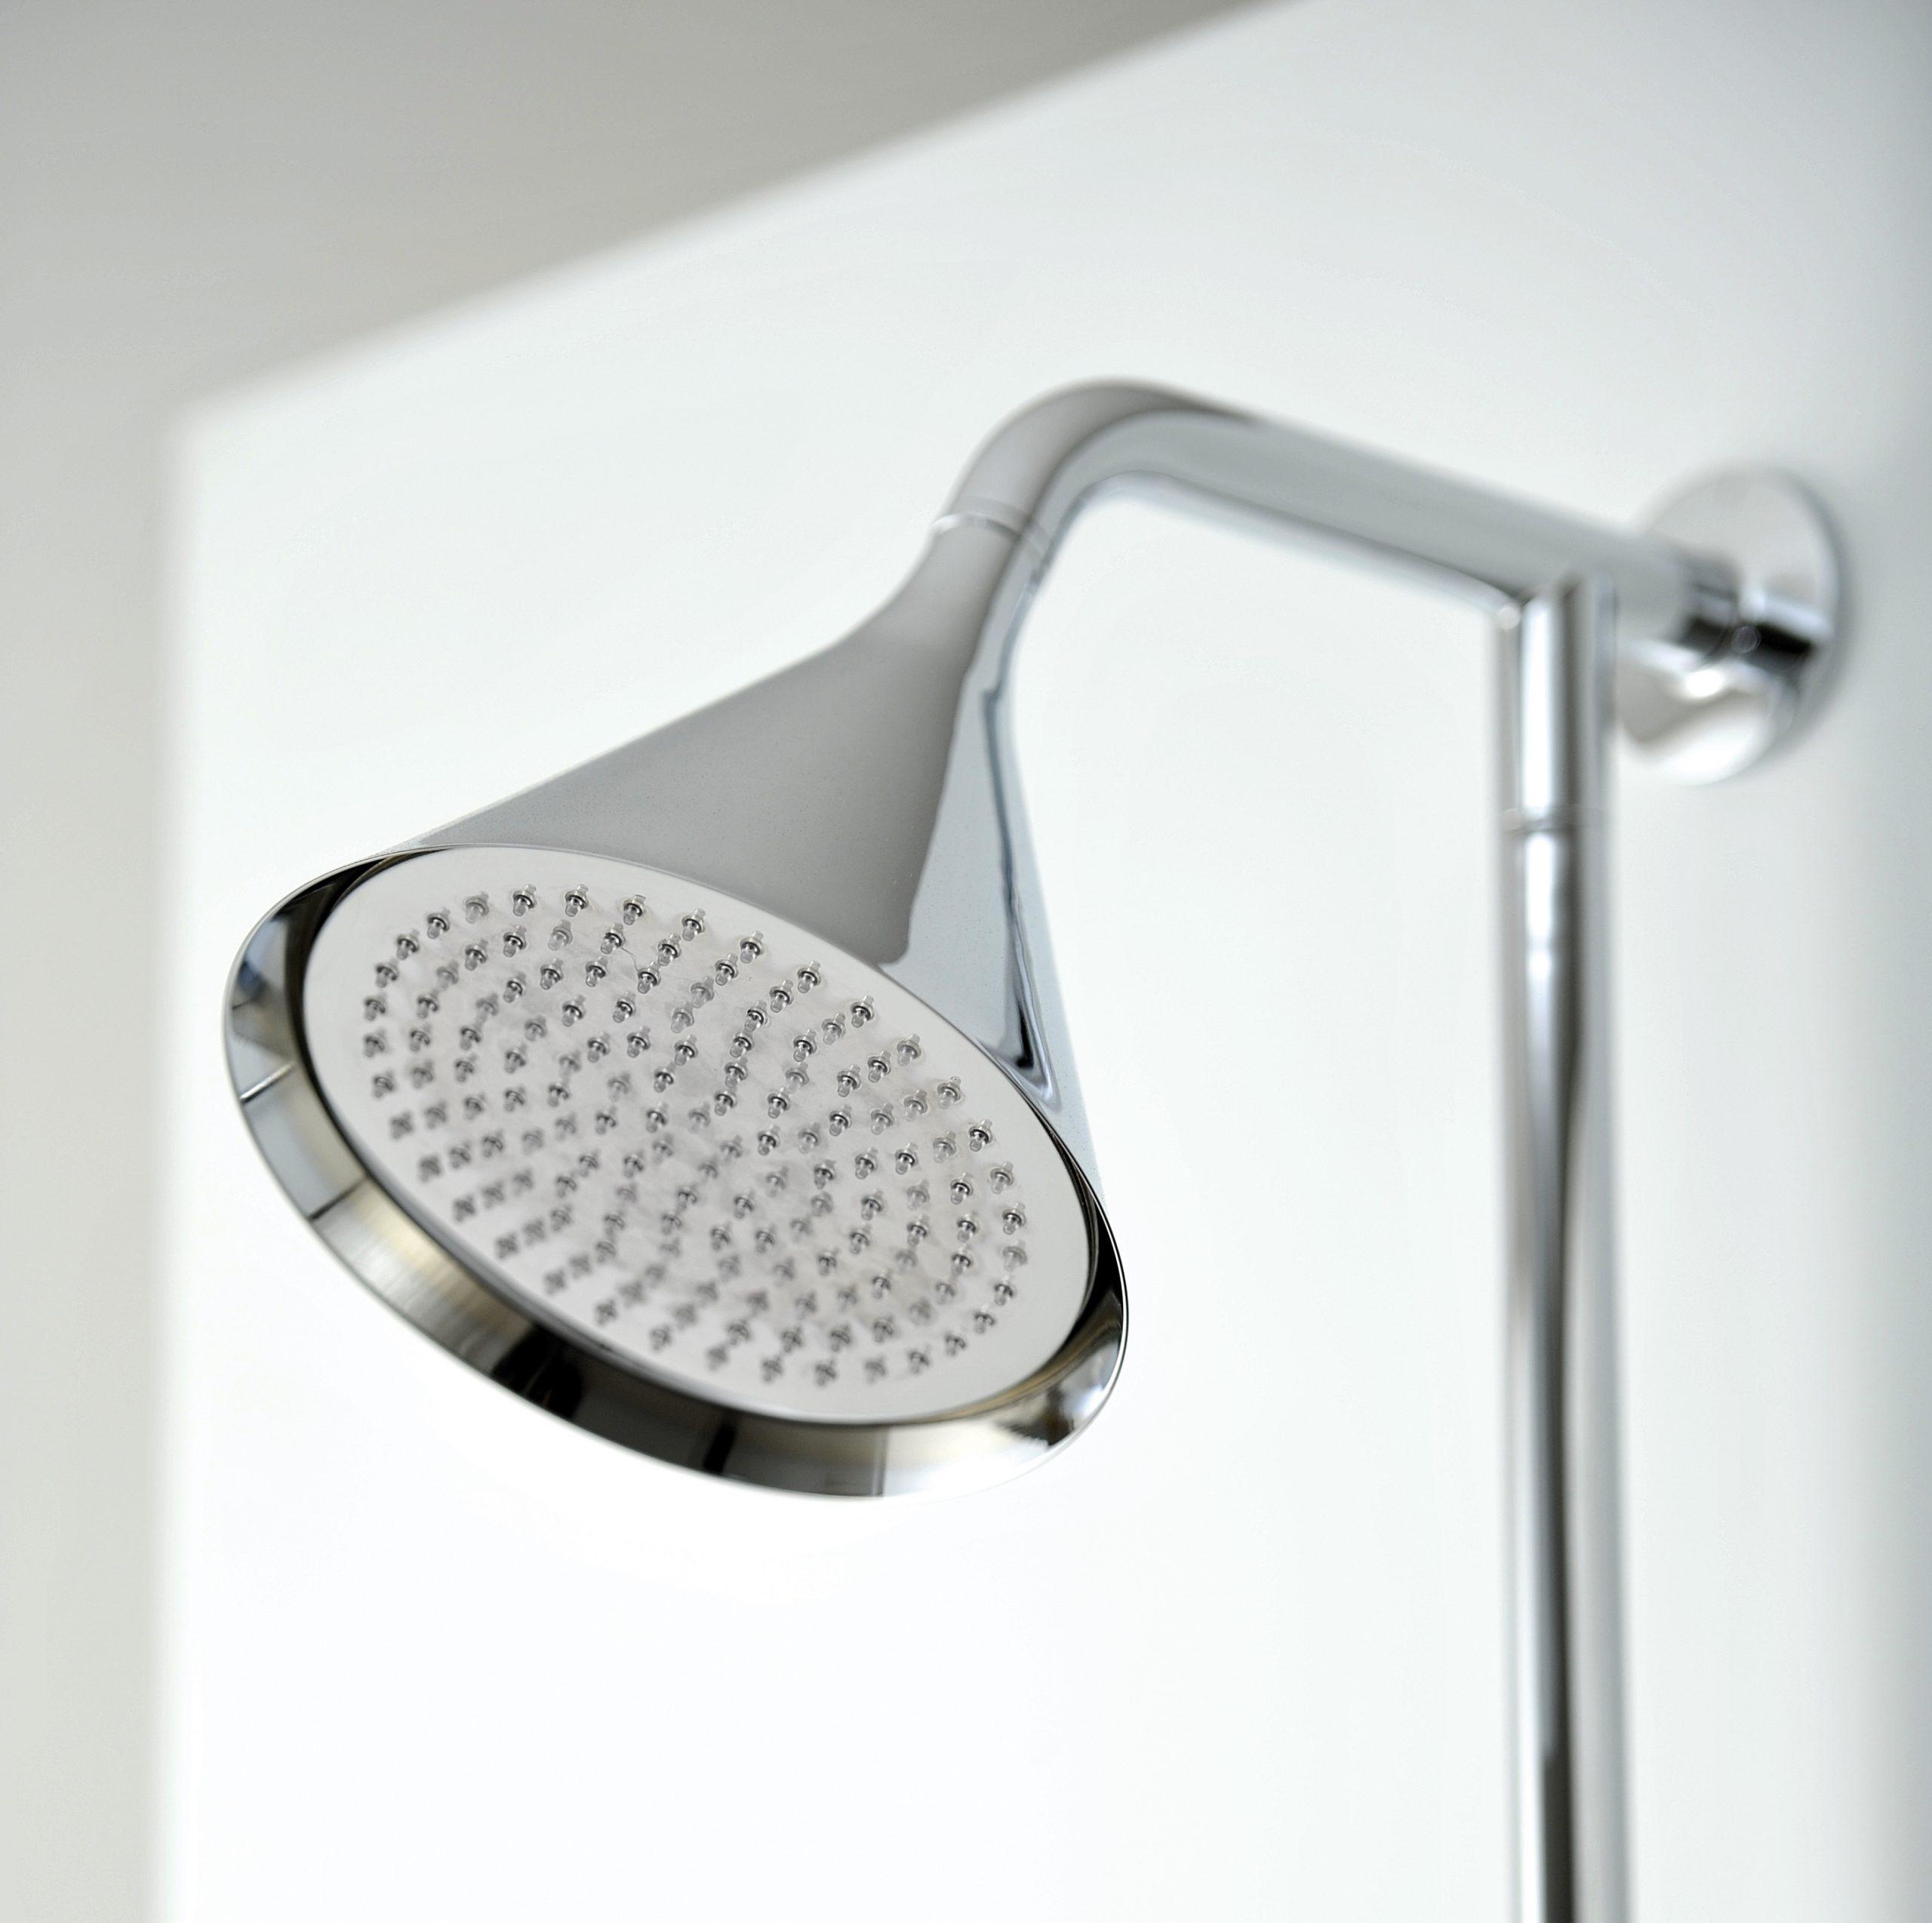 Detail of the Swing shower head by Debiasi Sandri for Bonomi